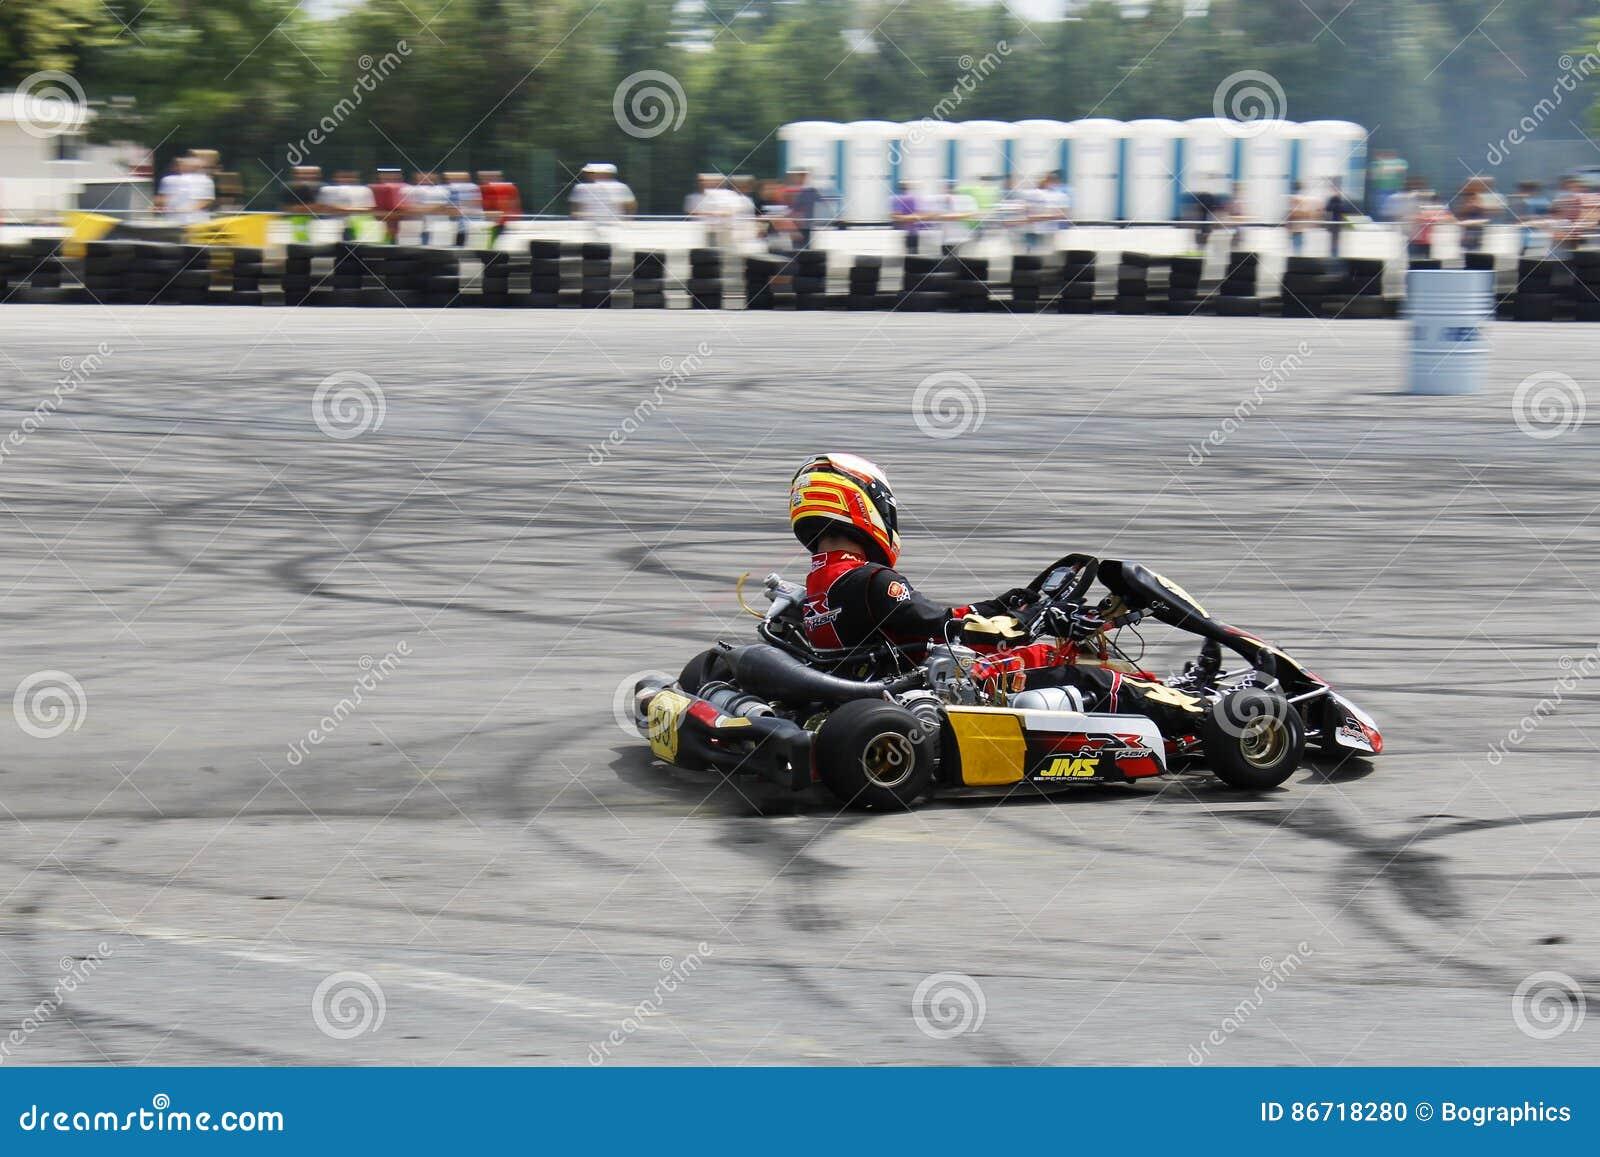 Download Focused Kart Racing Driver On Circuit Drifting Editorial Image - Image of drift, wheels: 86718280